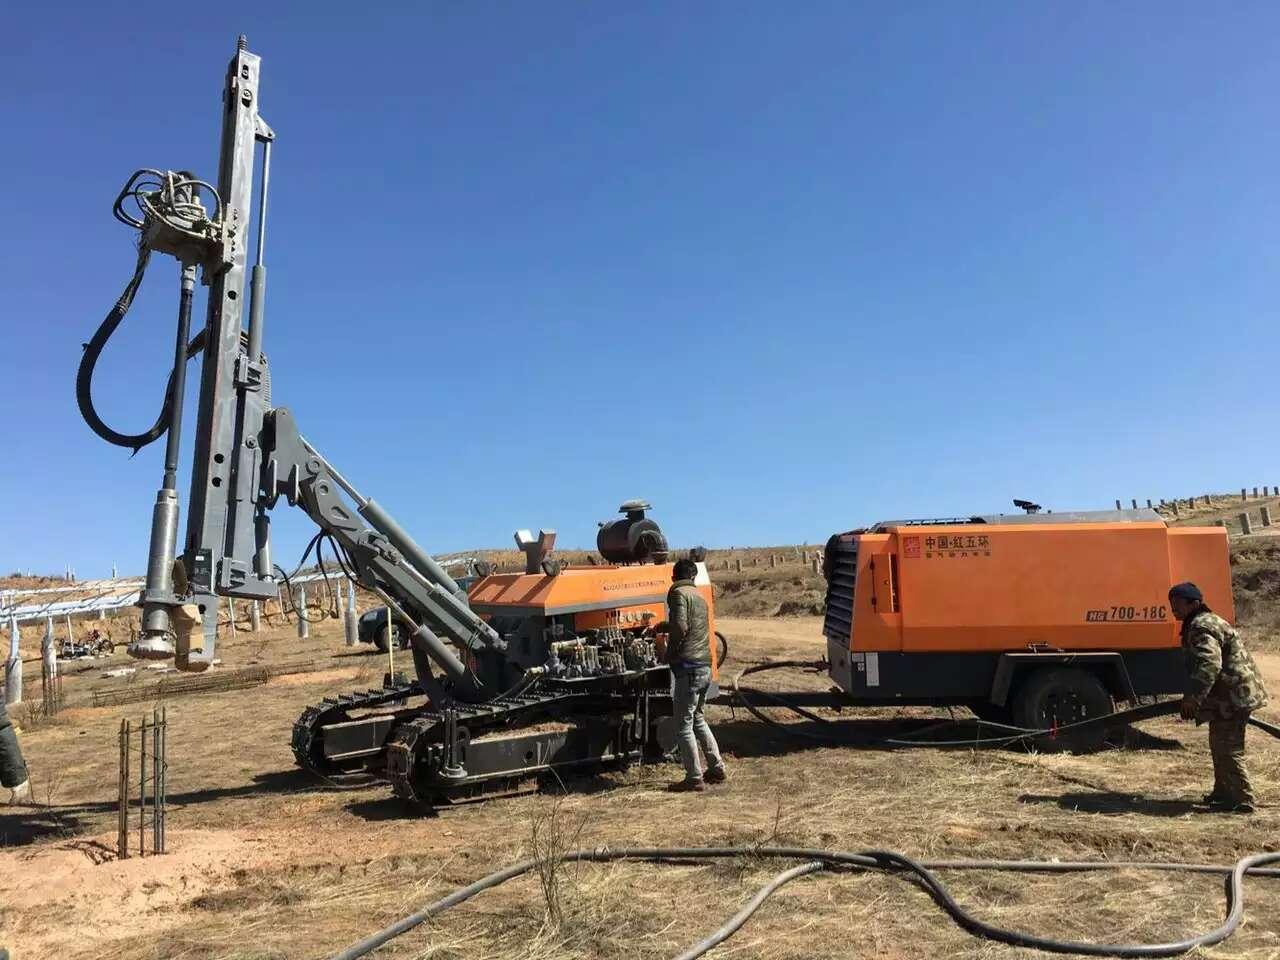 HG700M-18C Diesel Screw Air Compressor with Crawler Drilling Rig